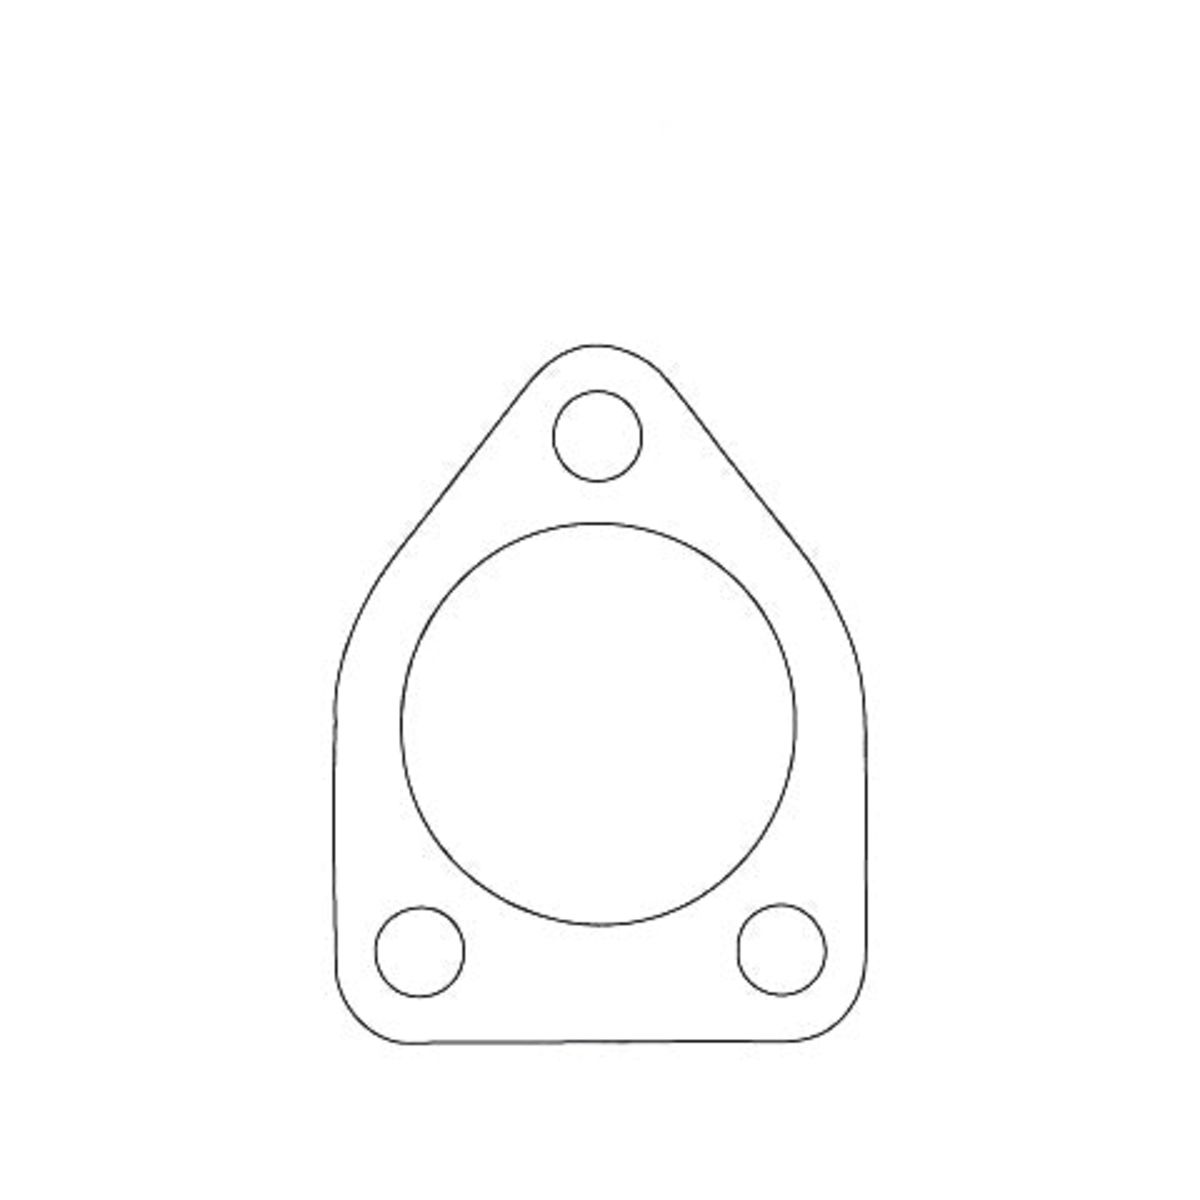 Flange Gaskets - Daihatsu Charade, 3 Bolts